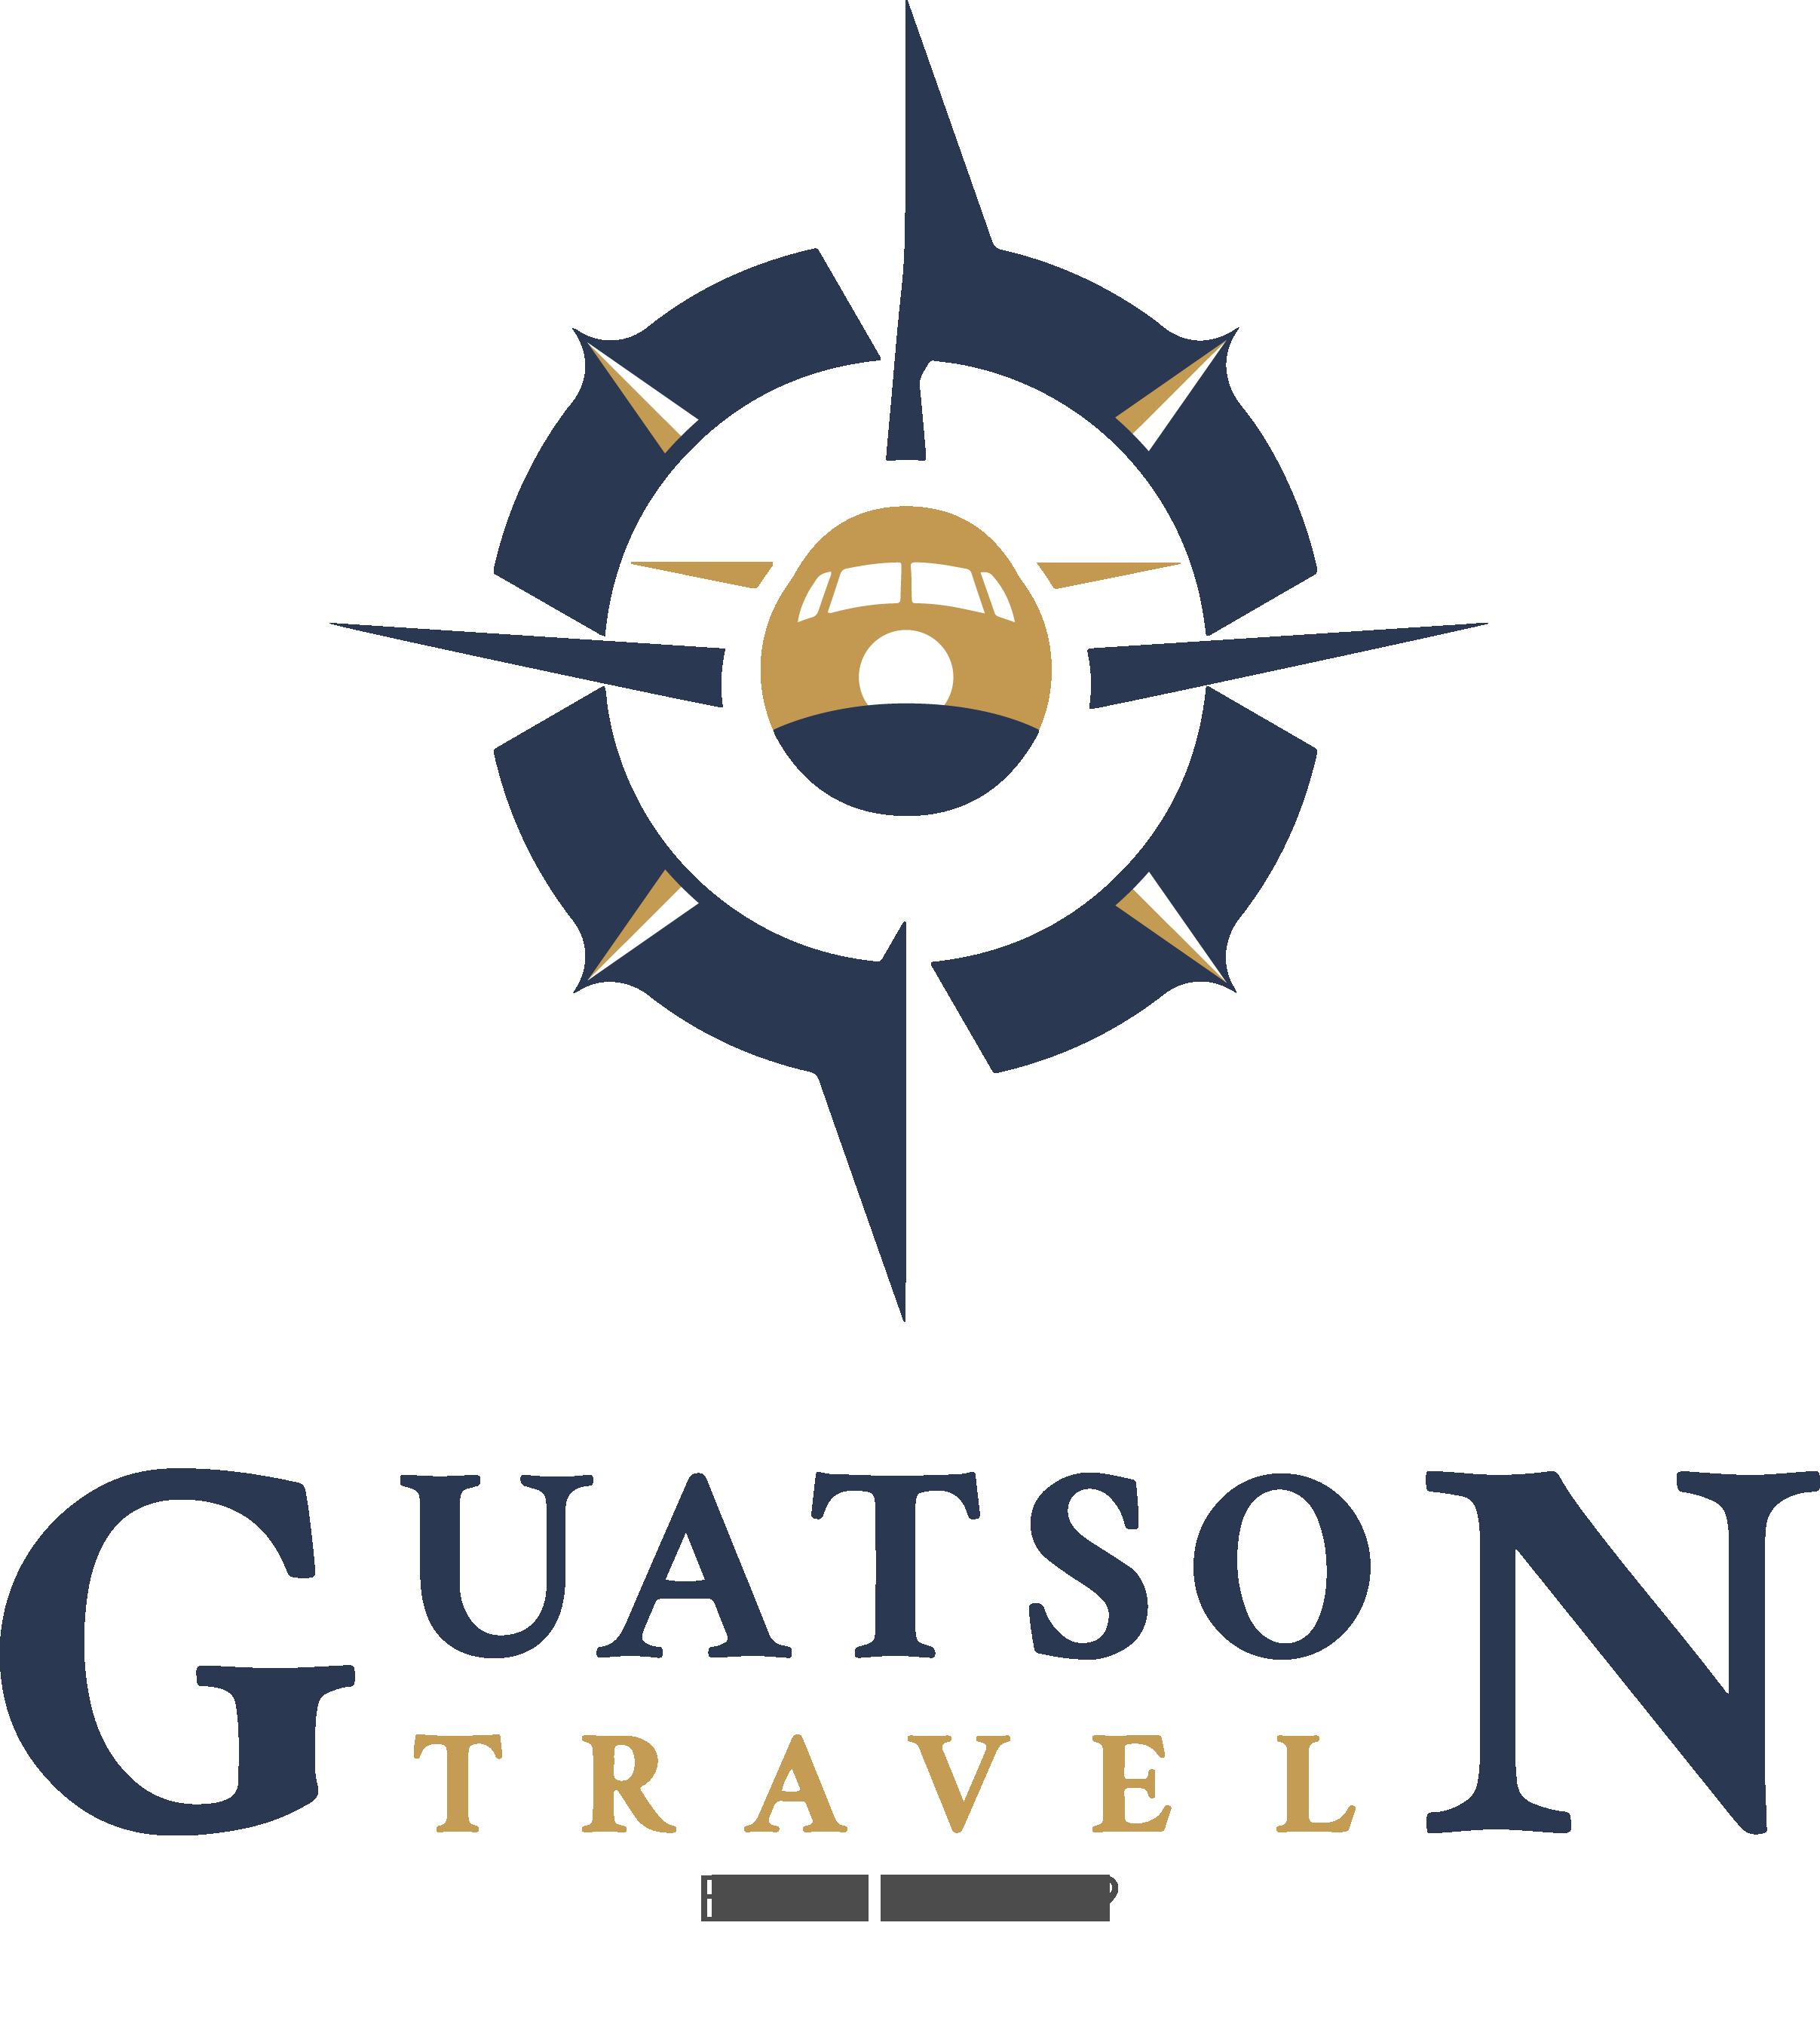 Guatson Travel